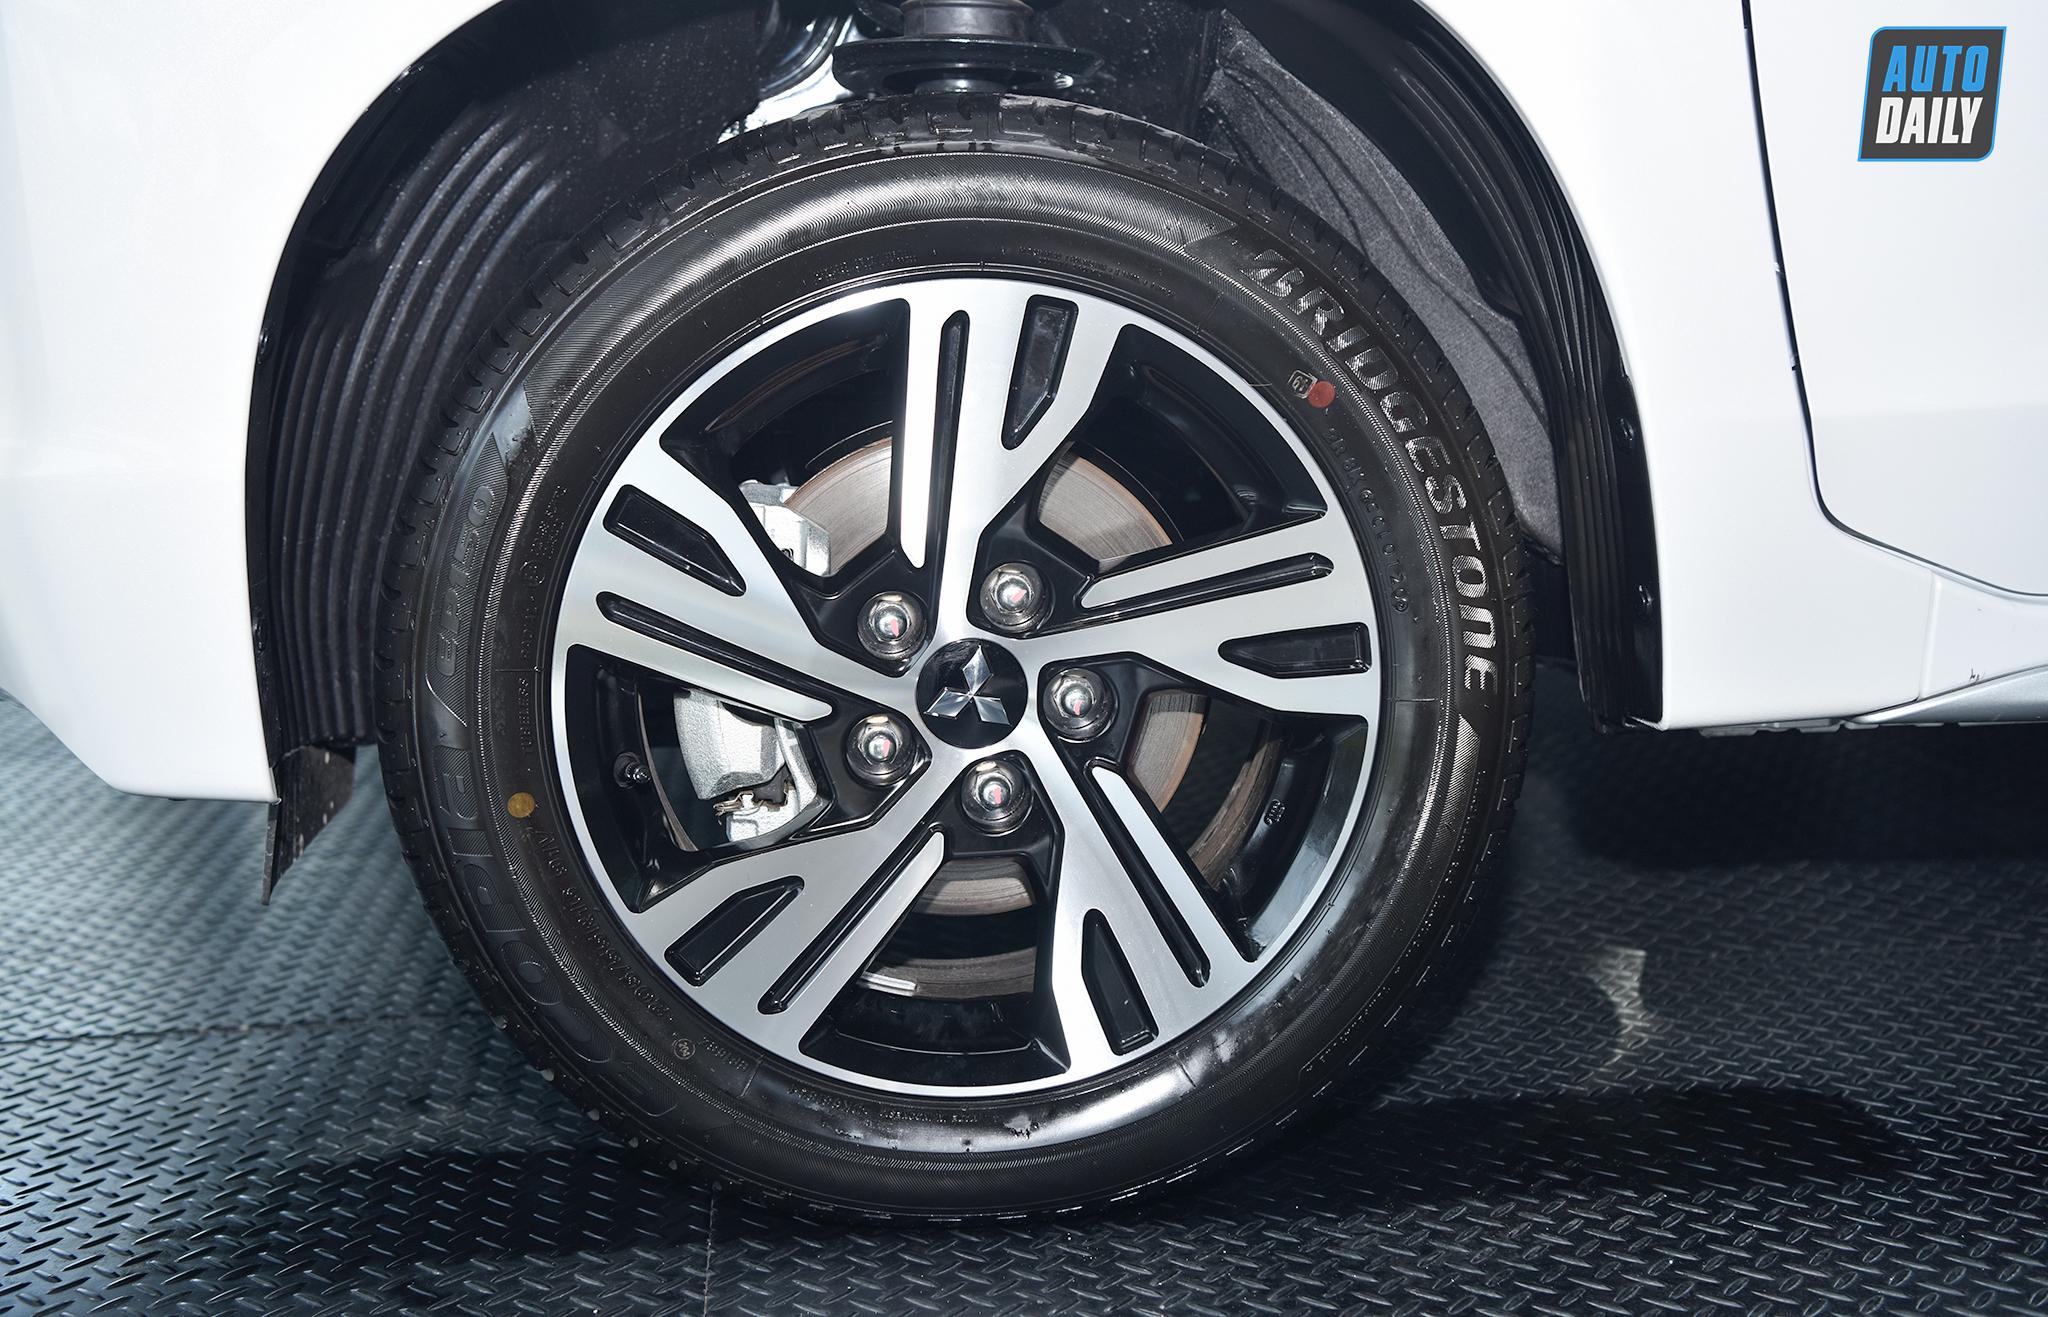 mitsubishi-xpander-2020-autodaily-06.jpg